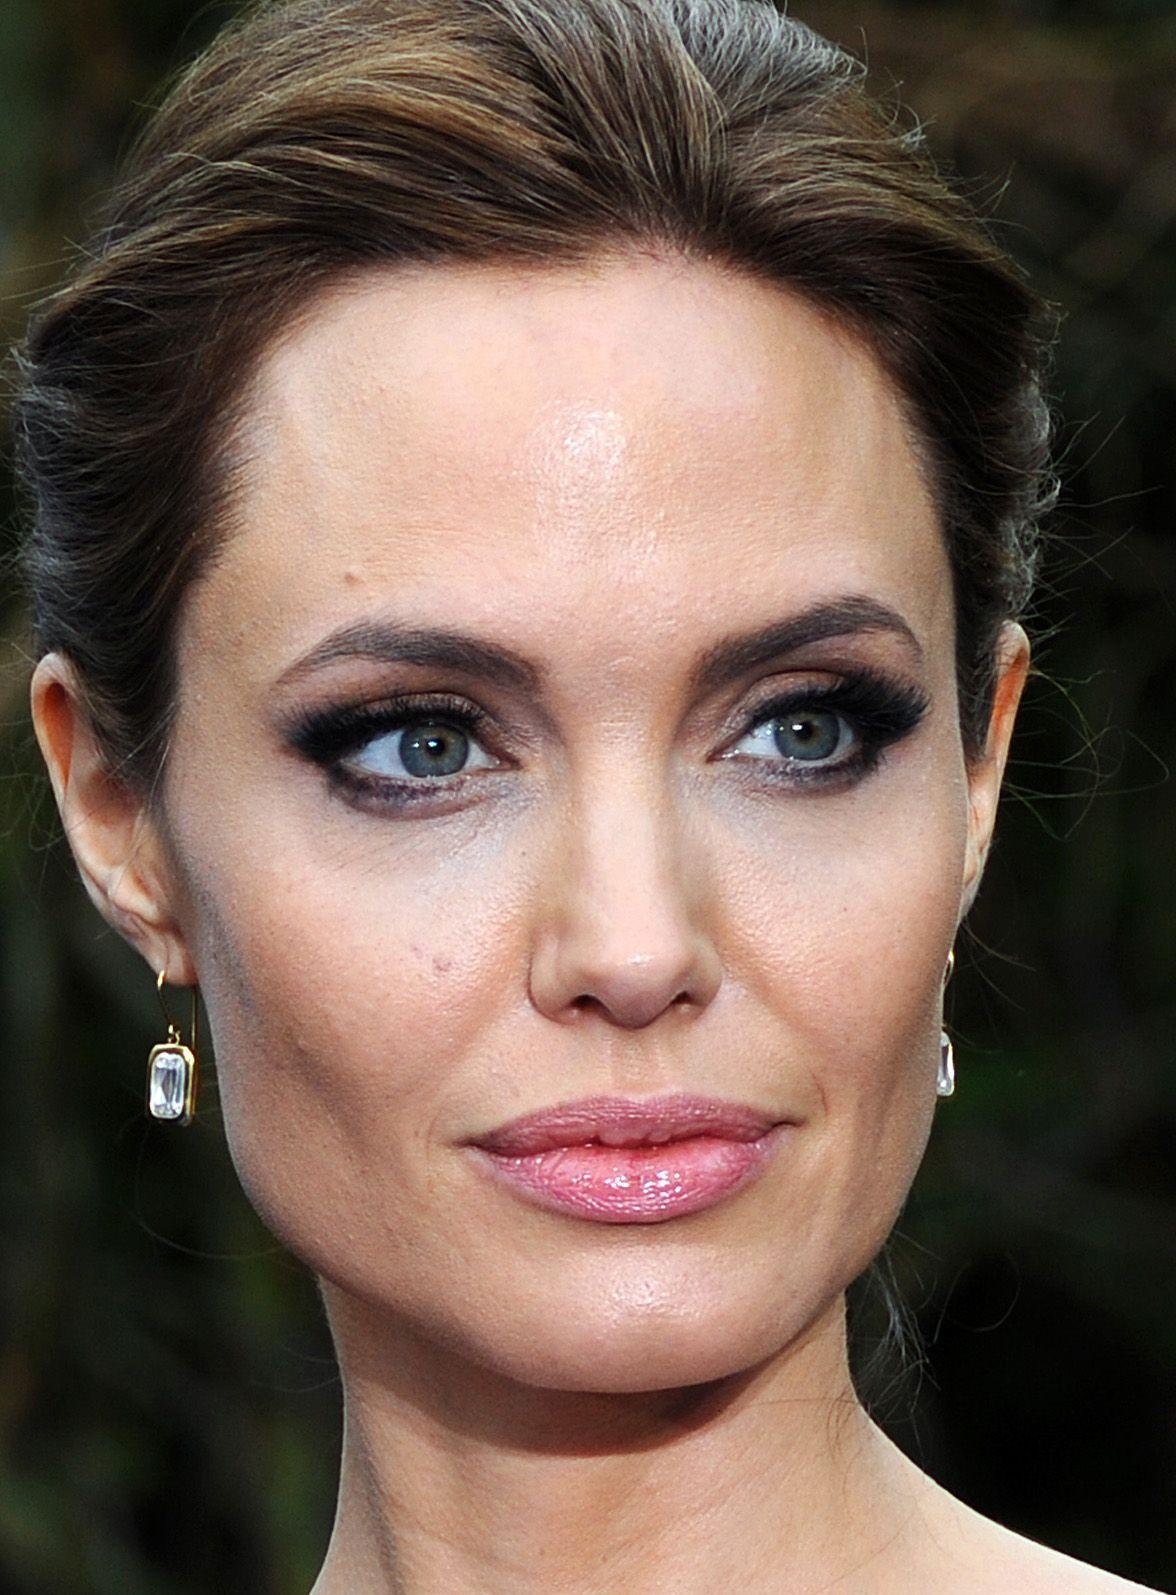 Angelina Jolie's makeup artist on sculpting your